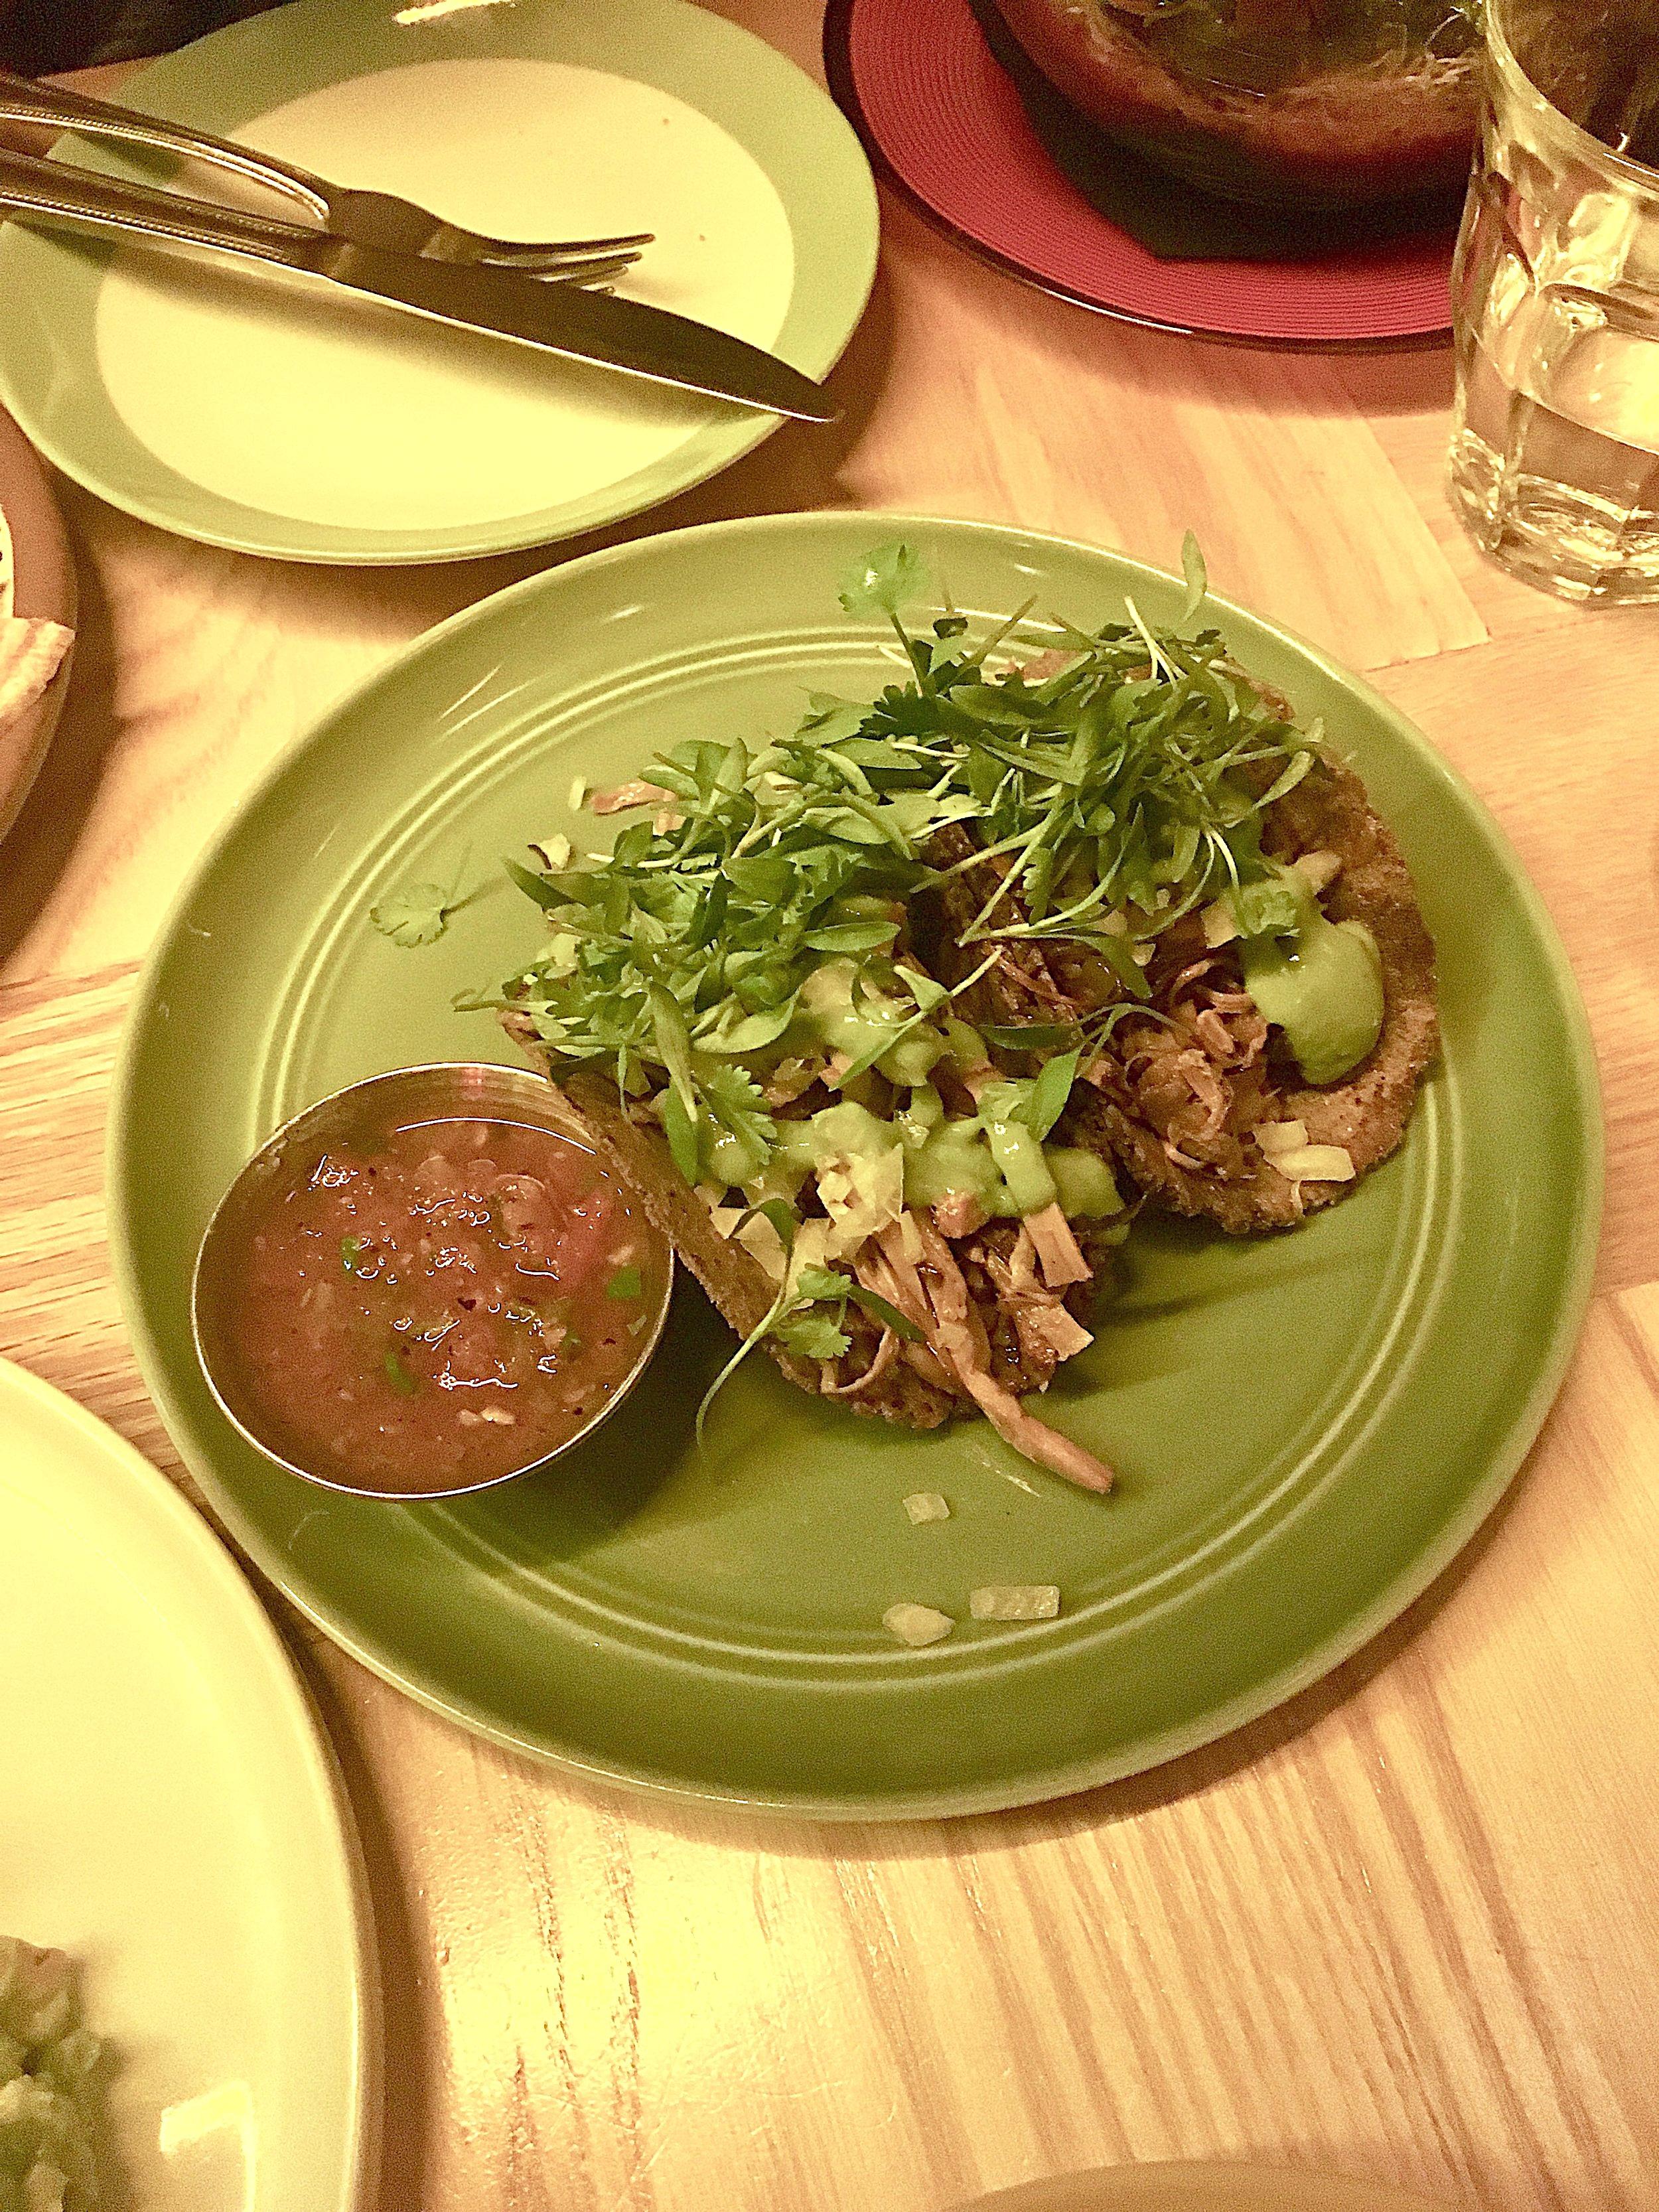 palm carnitas tacos // blueberry & flax seed tortilla, hearts of palm, jackfruit, orange, salsa verde, micro cilantro